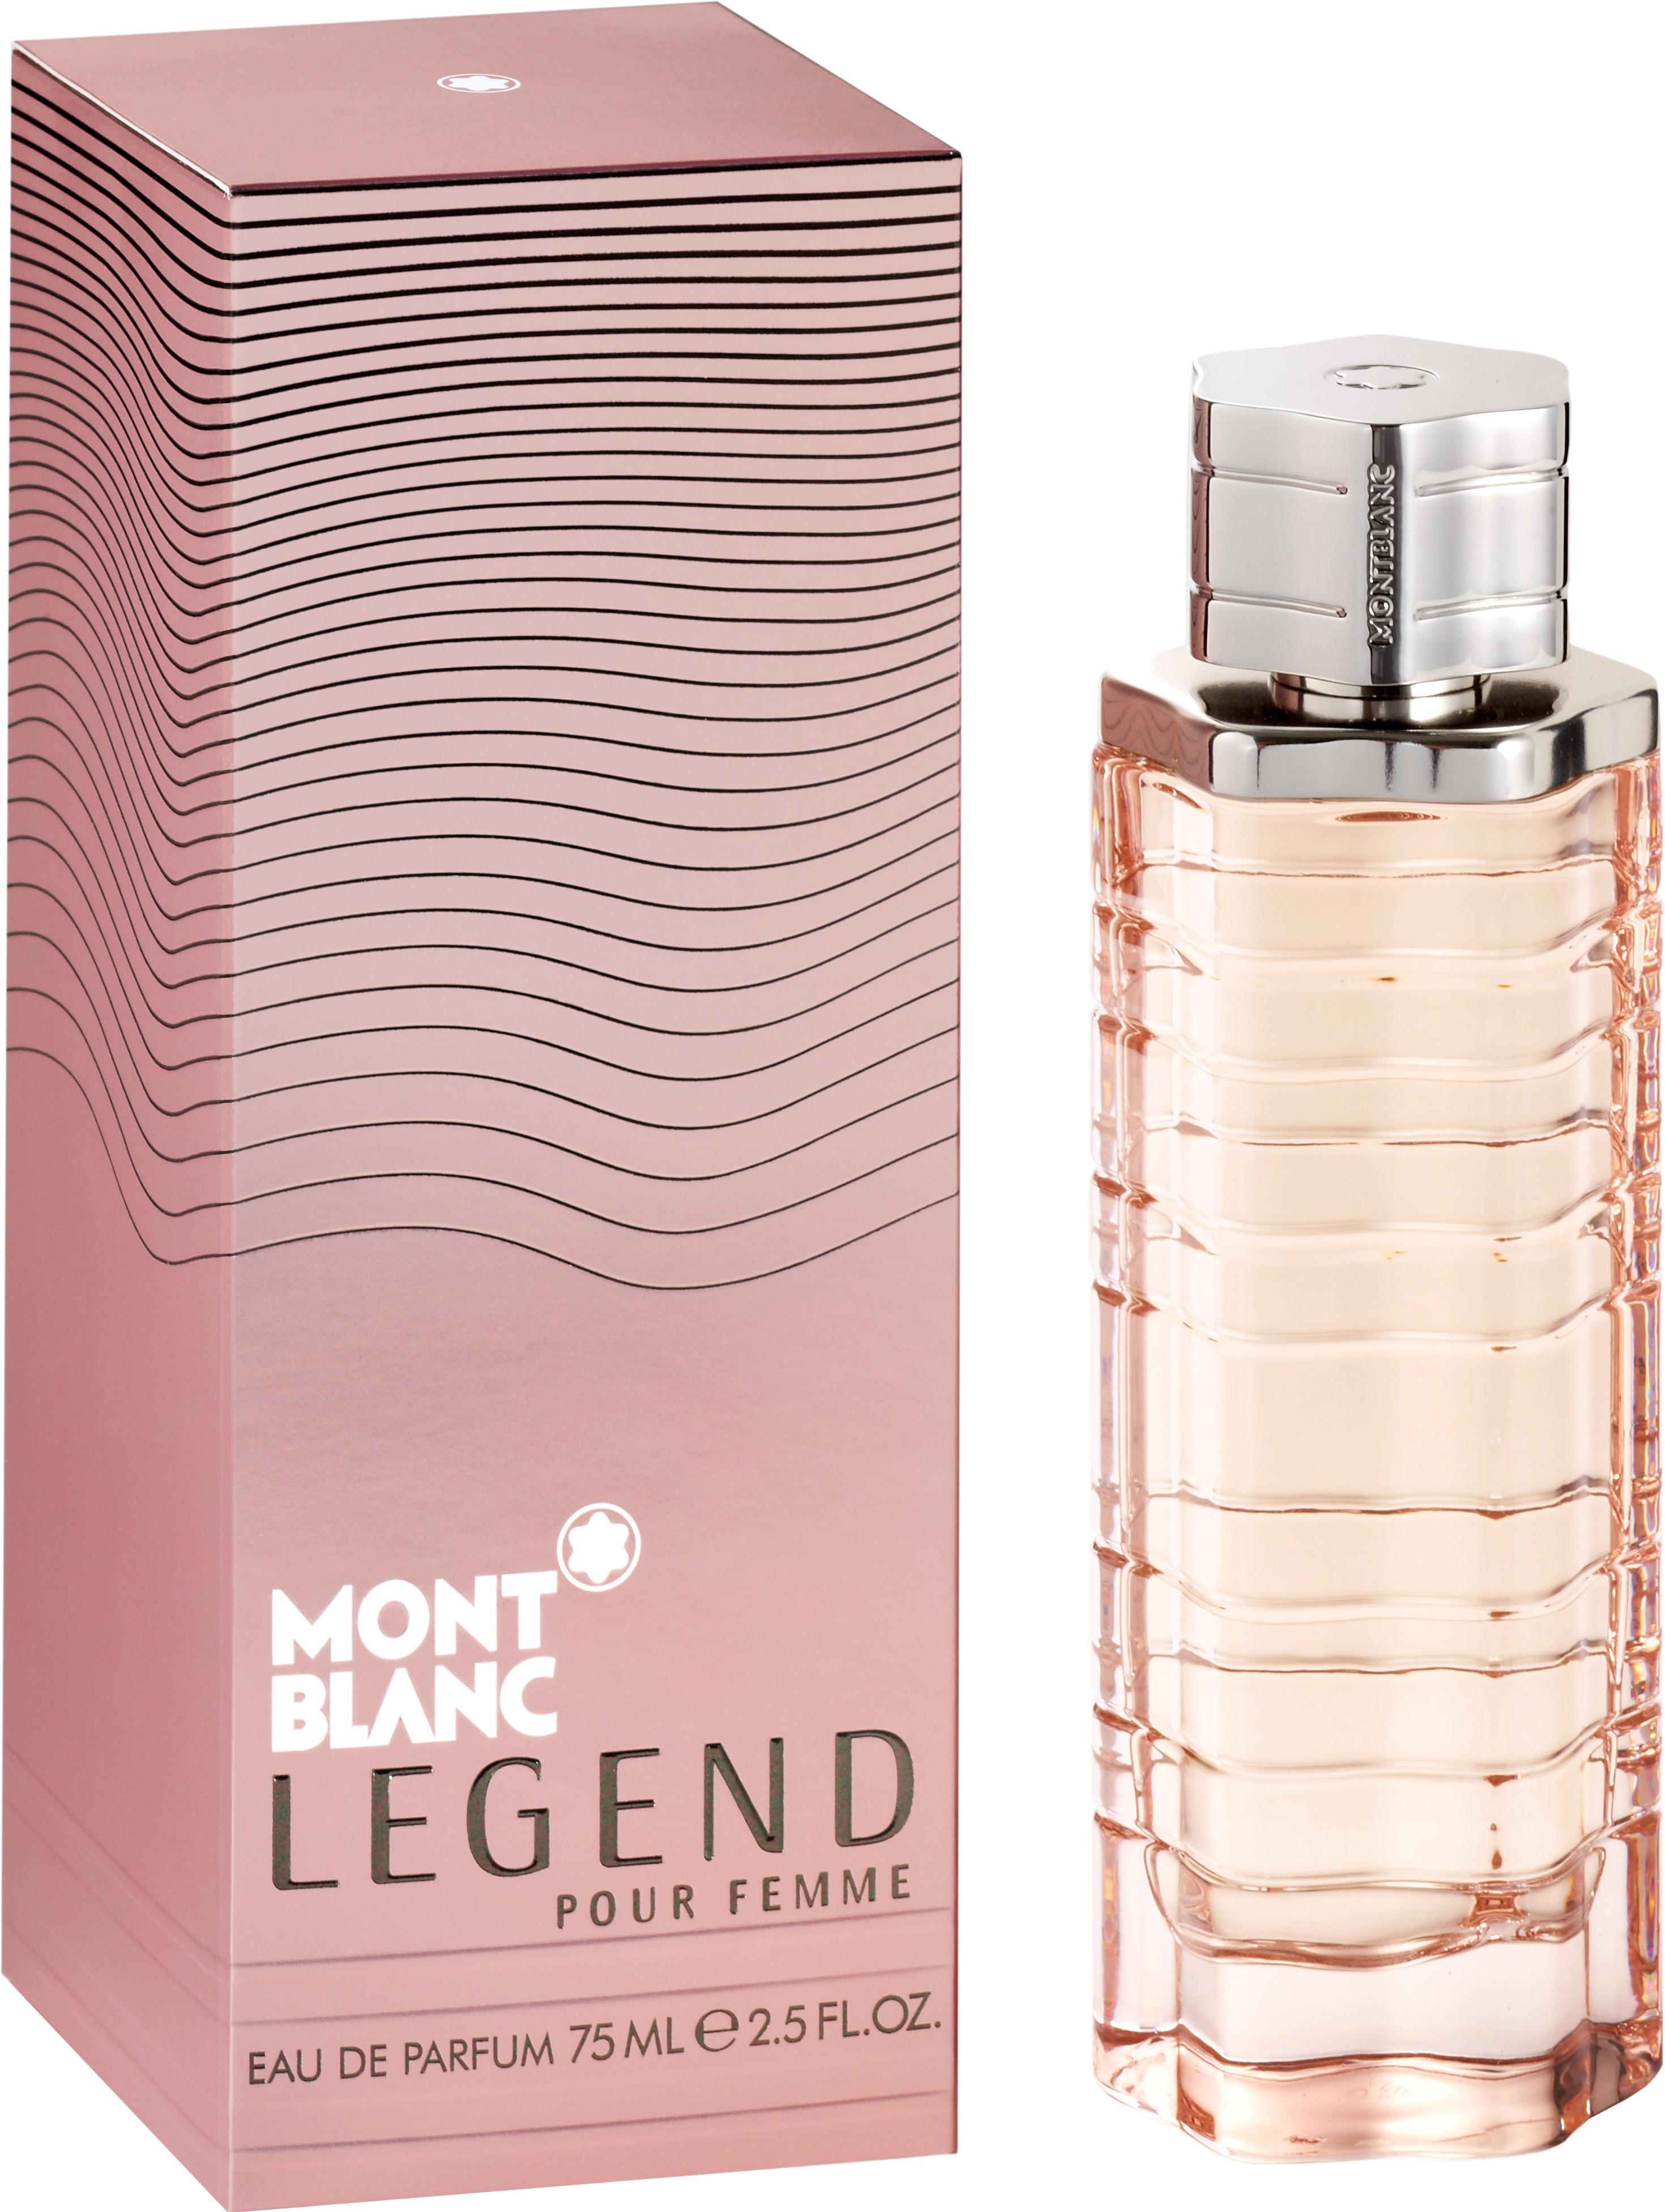 Mont Blanc Price List In India Buy Online At Best Parfum Original Legend For Men 100ml Eau De 75 Ml Women